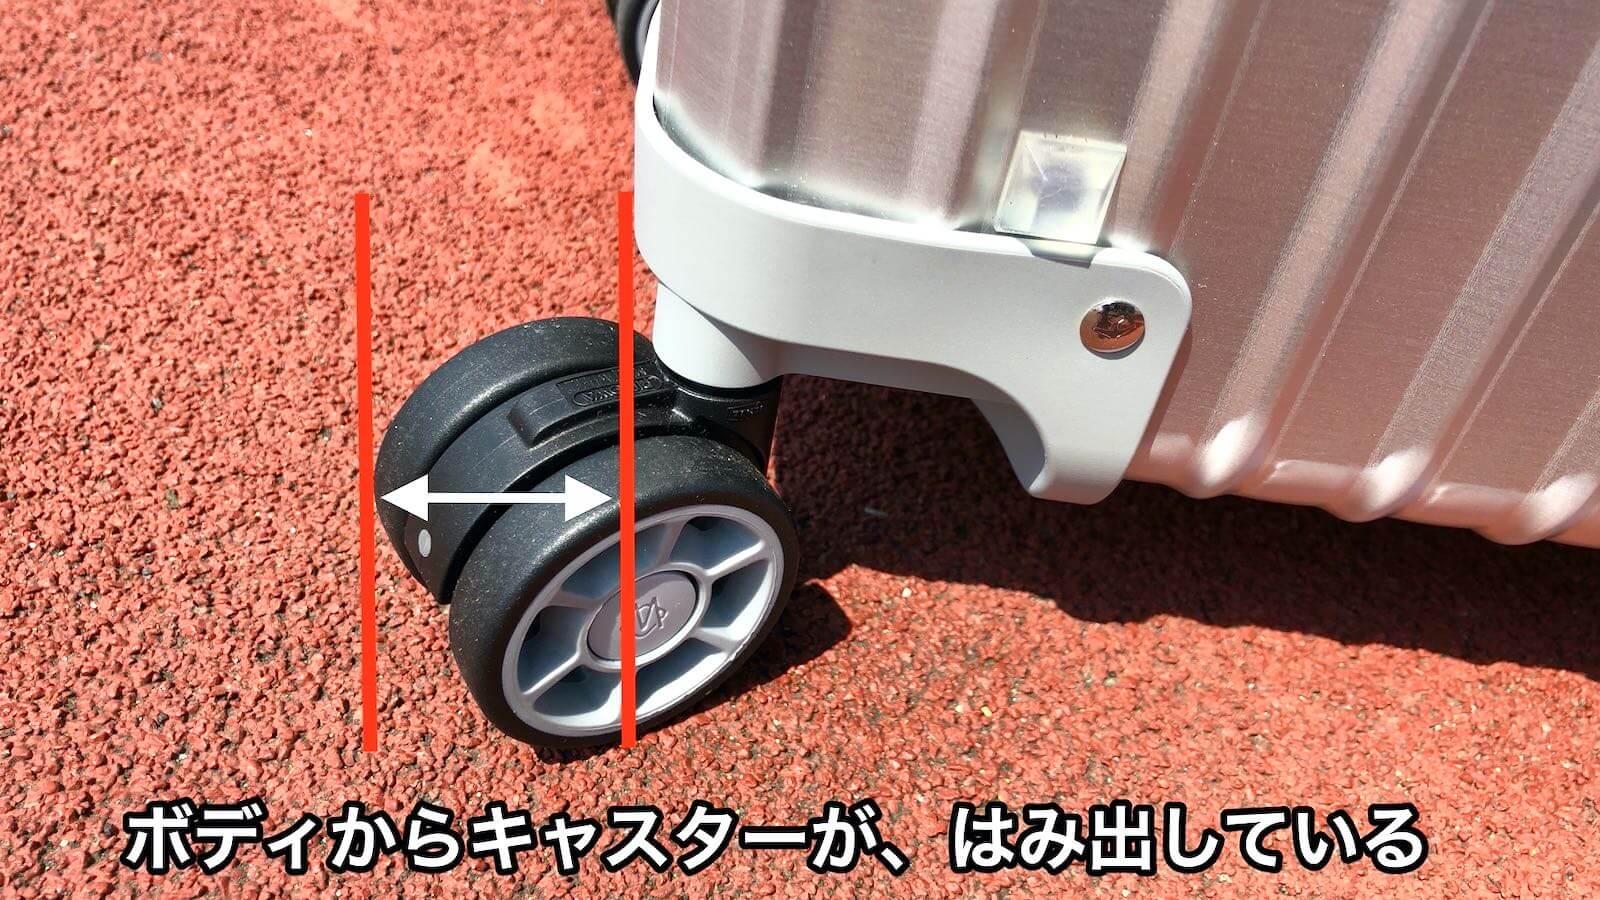 0228 Rimowa Classic Cabin S 33L Review 42